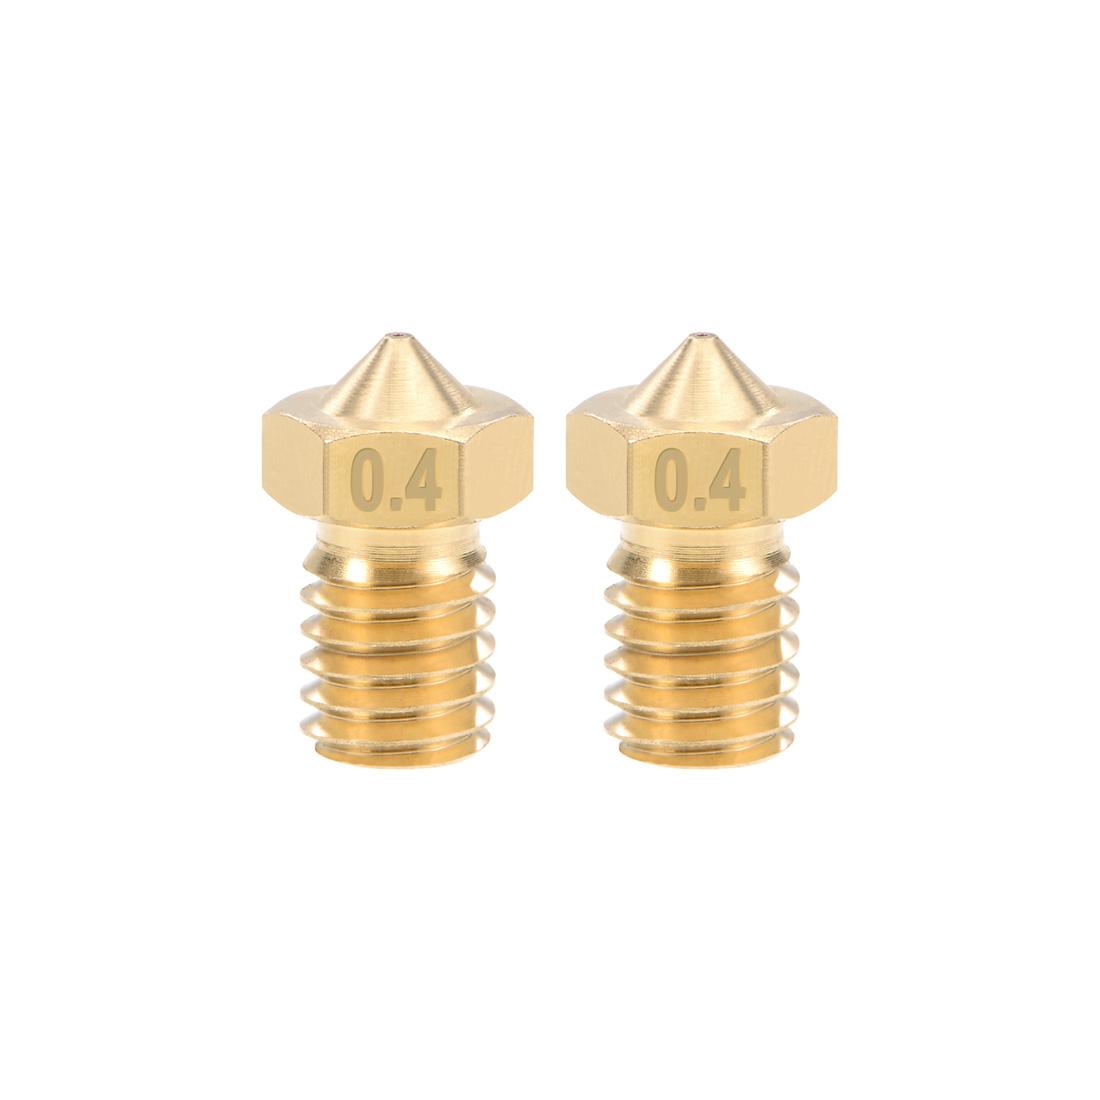 0.4mm 3D Printer Nozzle Head M6 Thread V5 V6 1.75mm Extruder Print Brass 2pcs